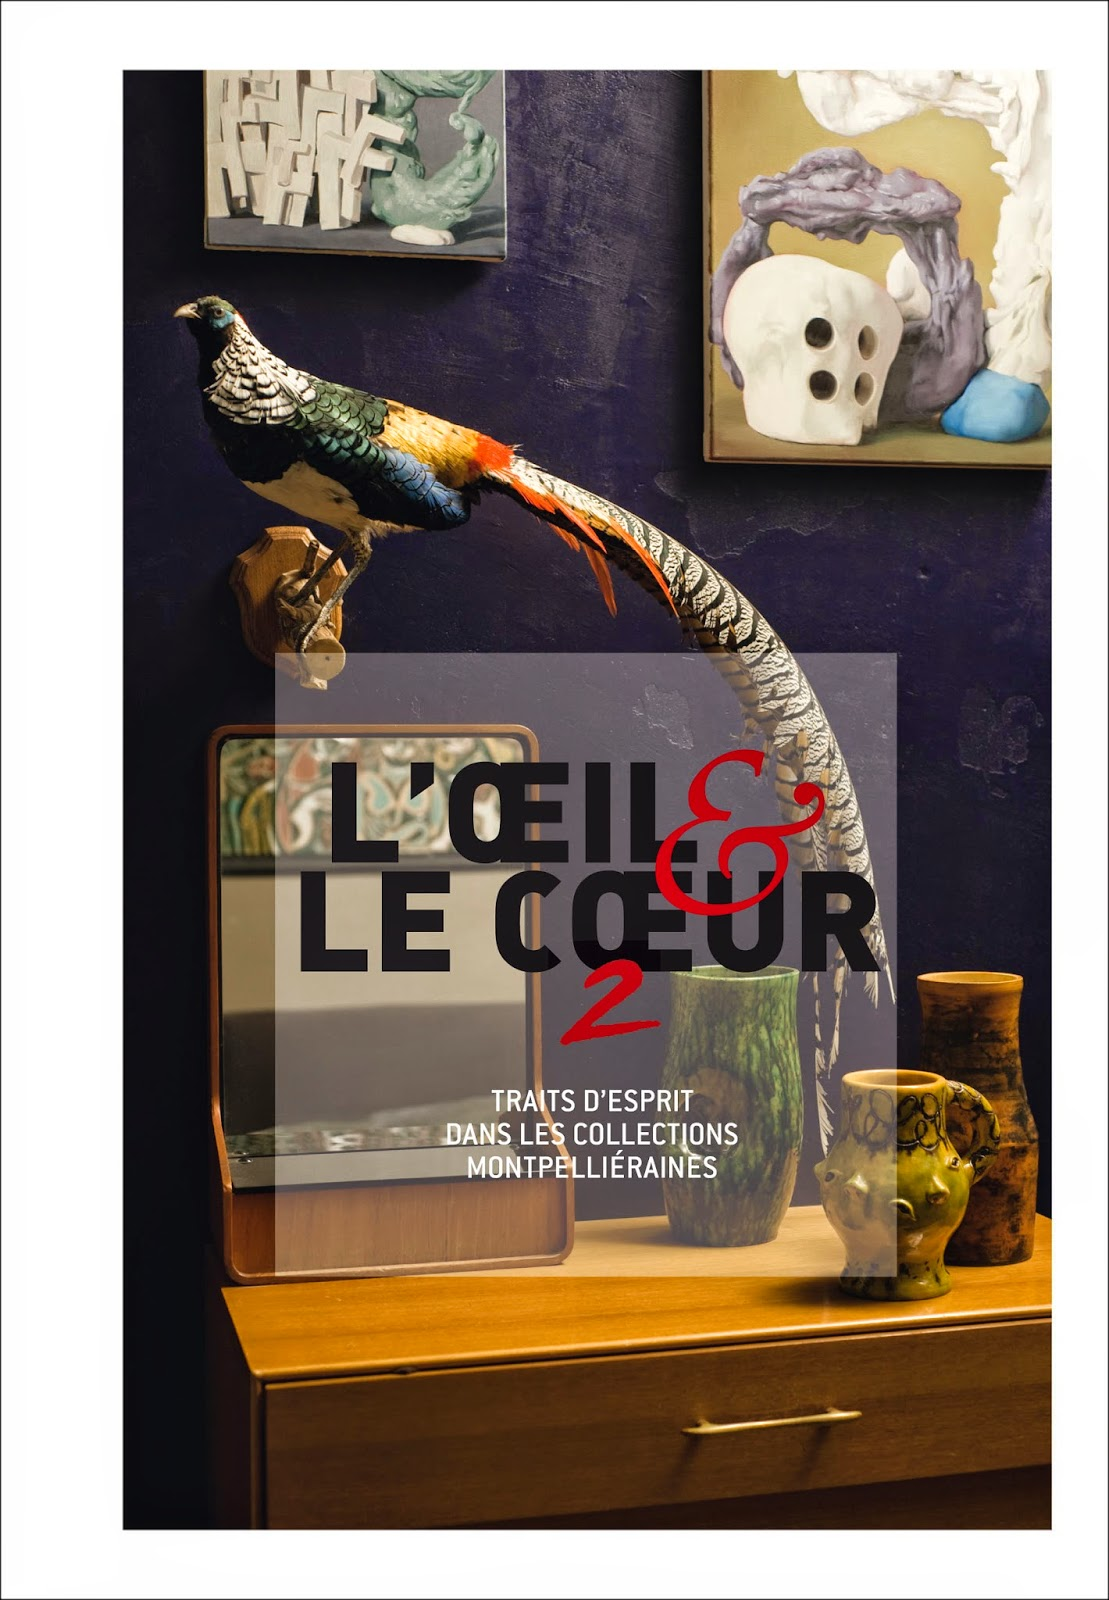 COUV_oeilcoeur2